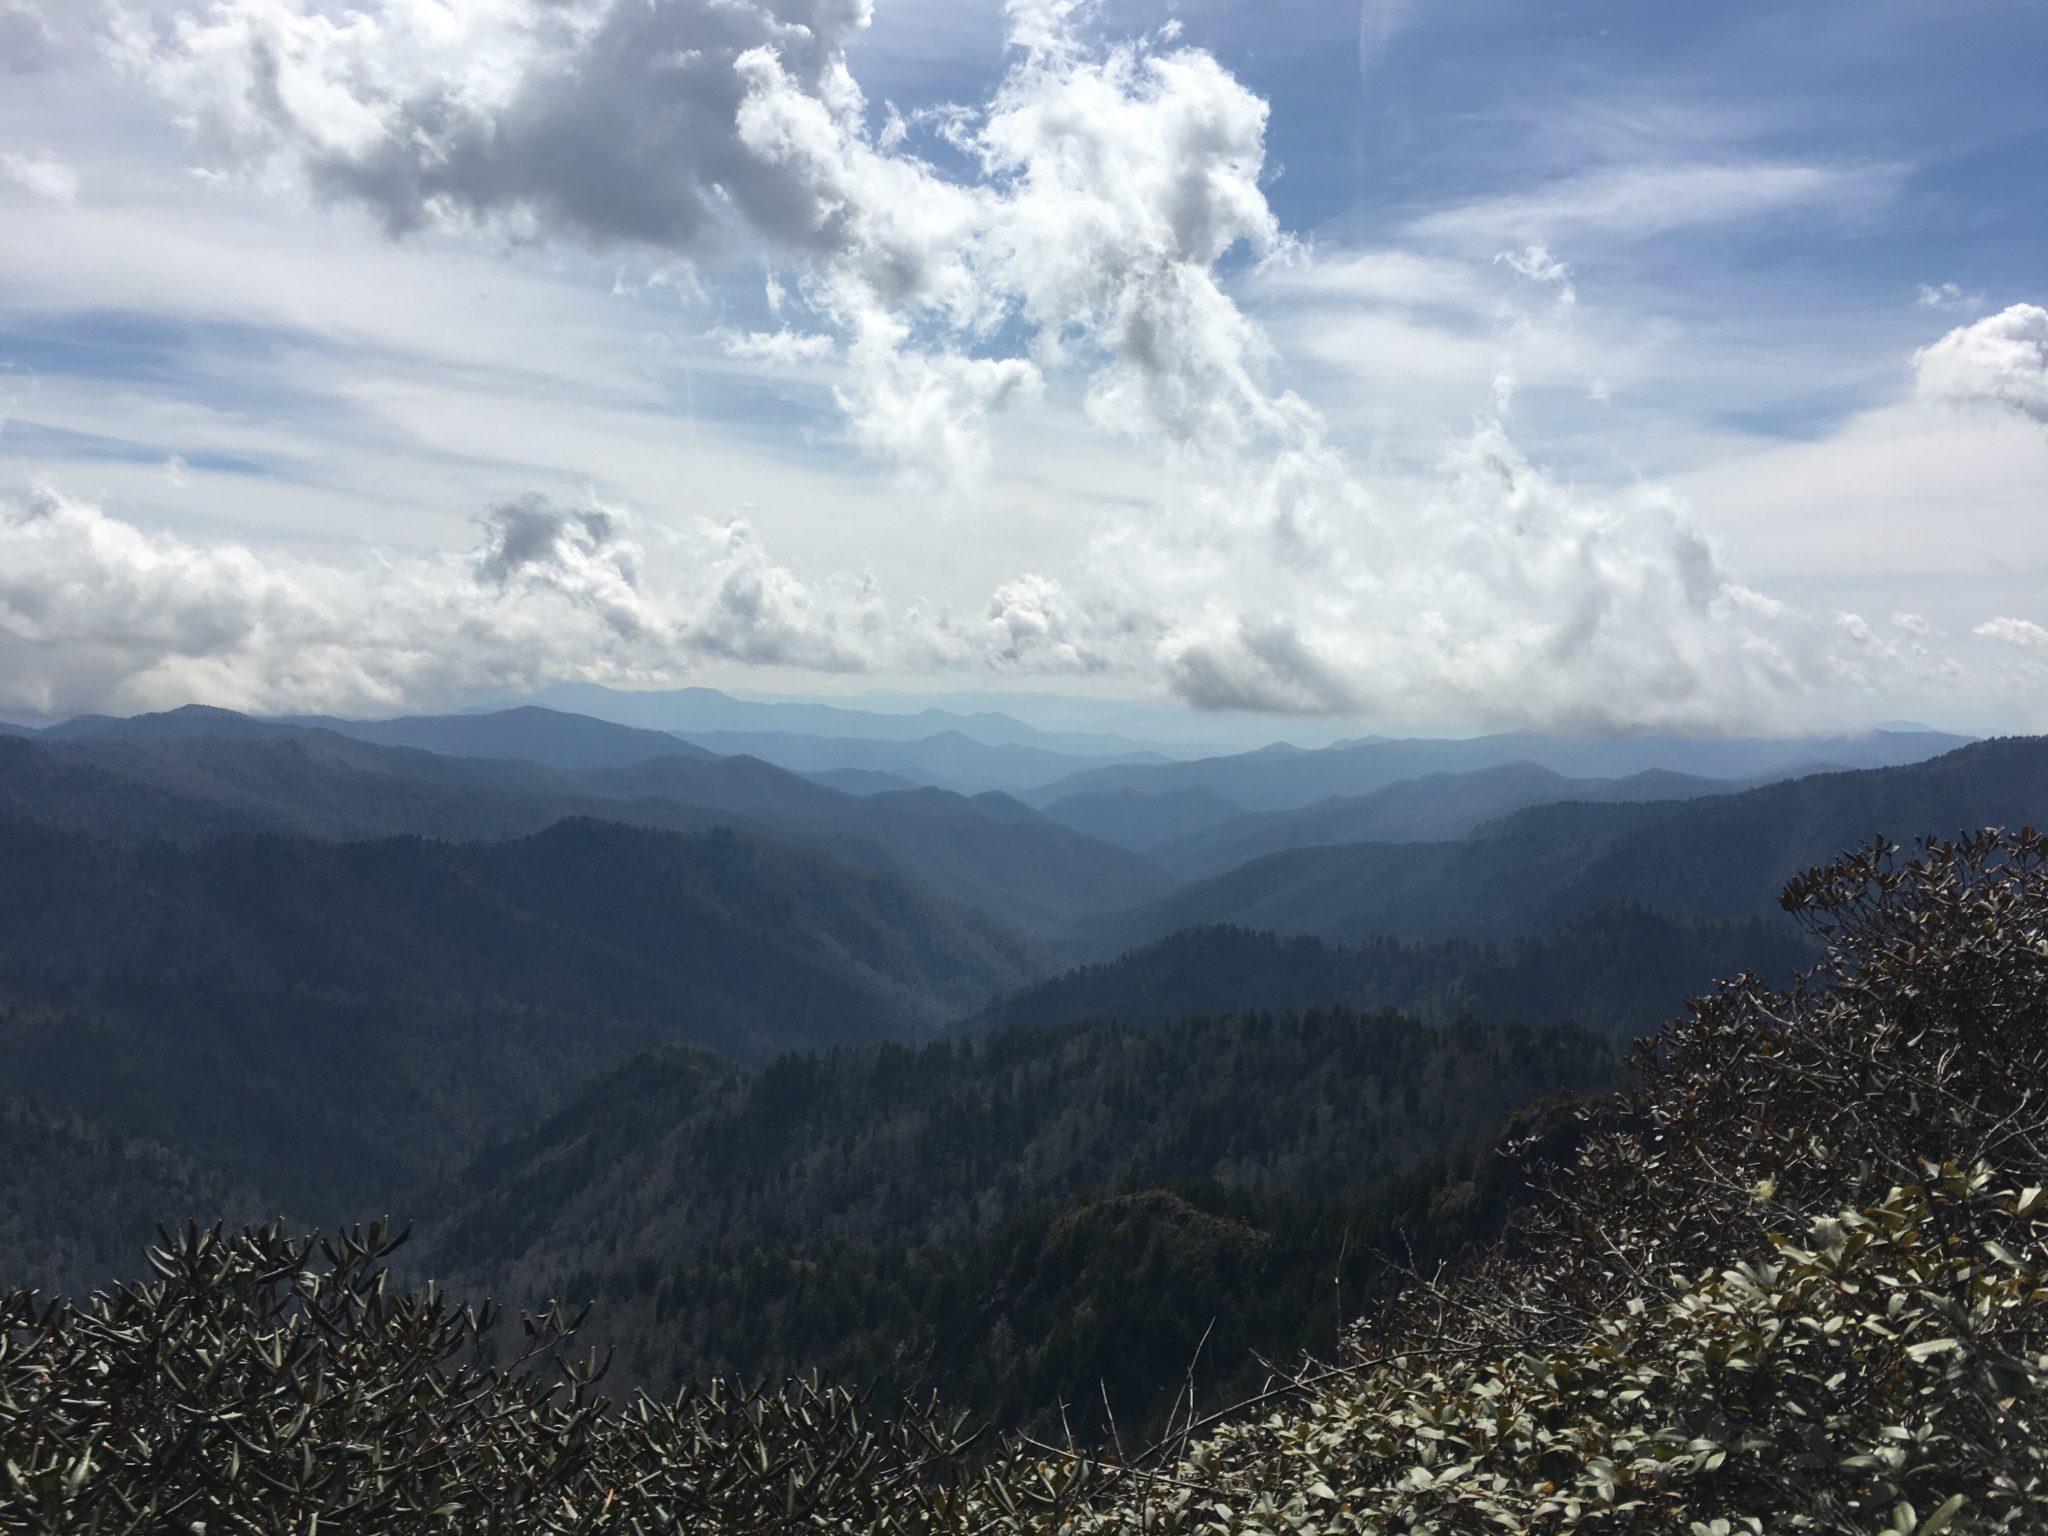 Beautiful views of the Smoky Mountains